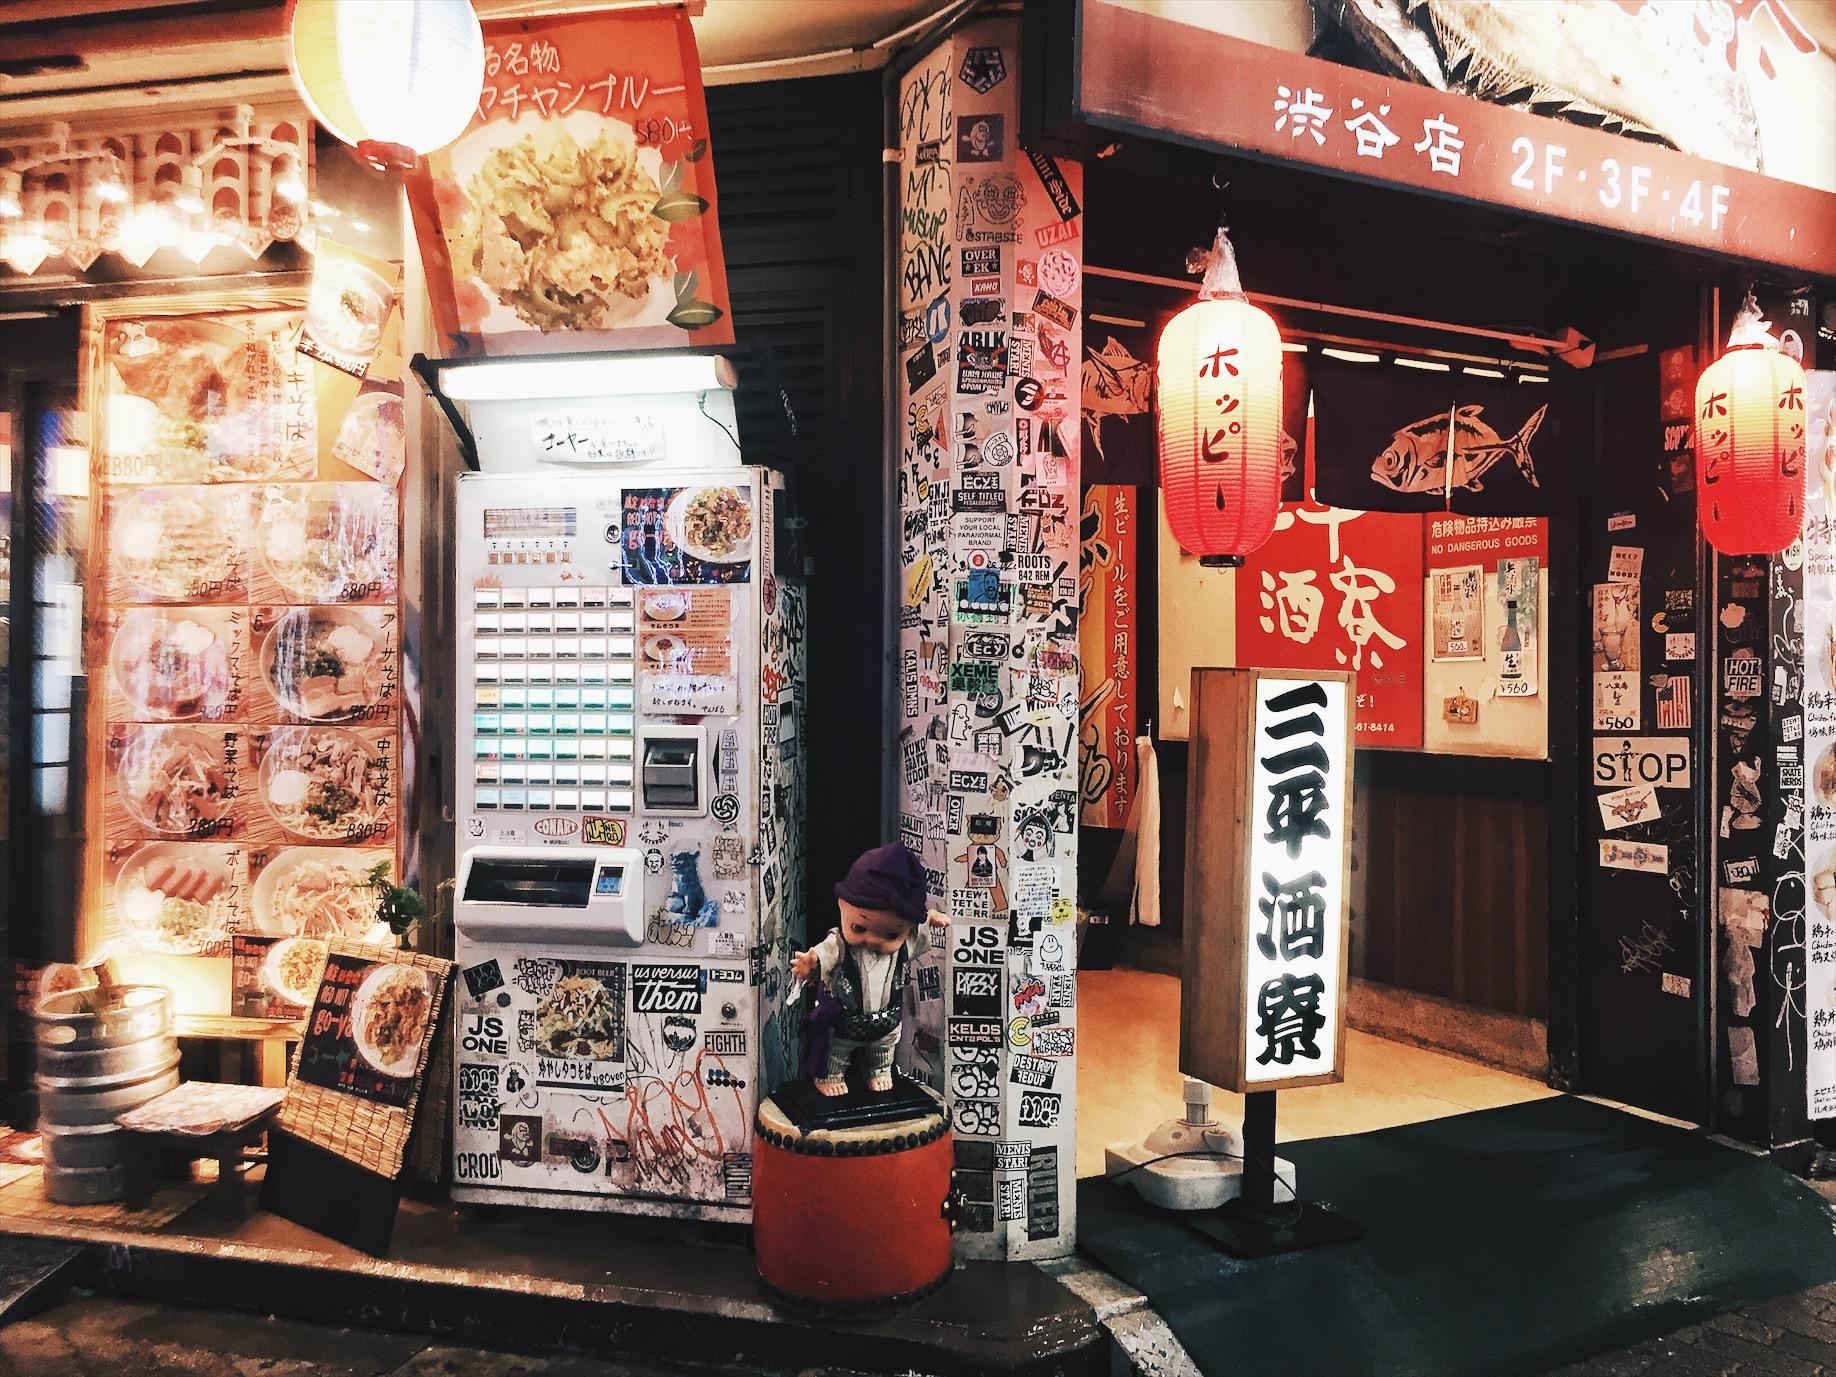 Basic Japanese to Know - Hello / Goodbye - Konnichiwa / SayonaraGood morning / Good evening - Ohayou / KonbanwaExcuse me - SumimasenThank you / Thank you very much - Arigatou / Arigatou gozaimashitaYou're welcome - Do itashimashite (formal, although I often that people tend to just exchanging